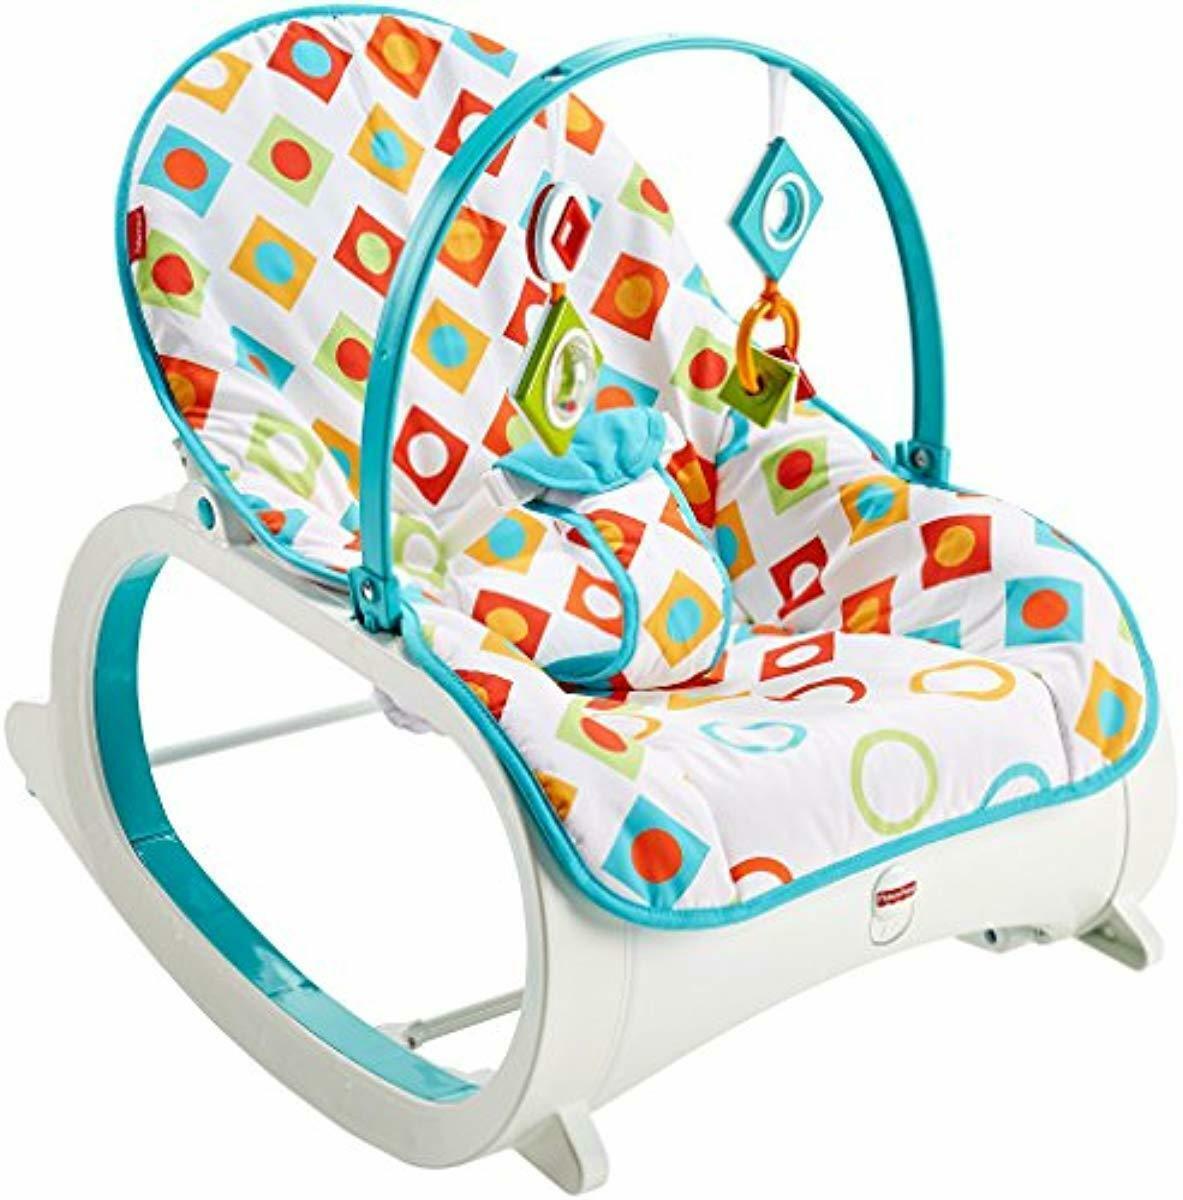 Best Baby Rocker Sleeper Chair Small Big Boy Girl for Babies